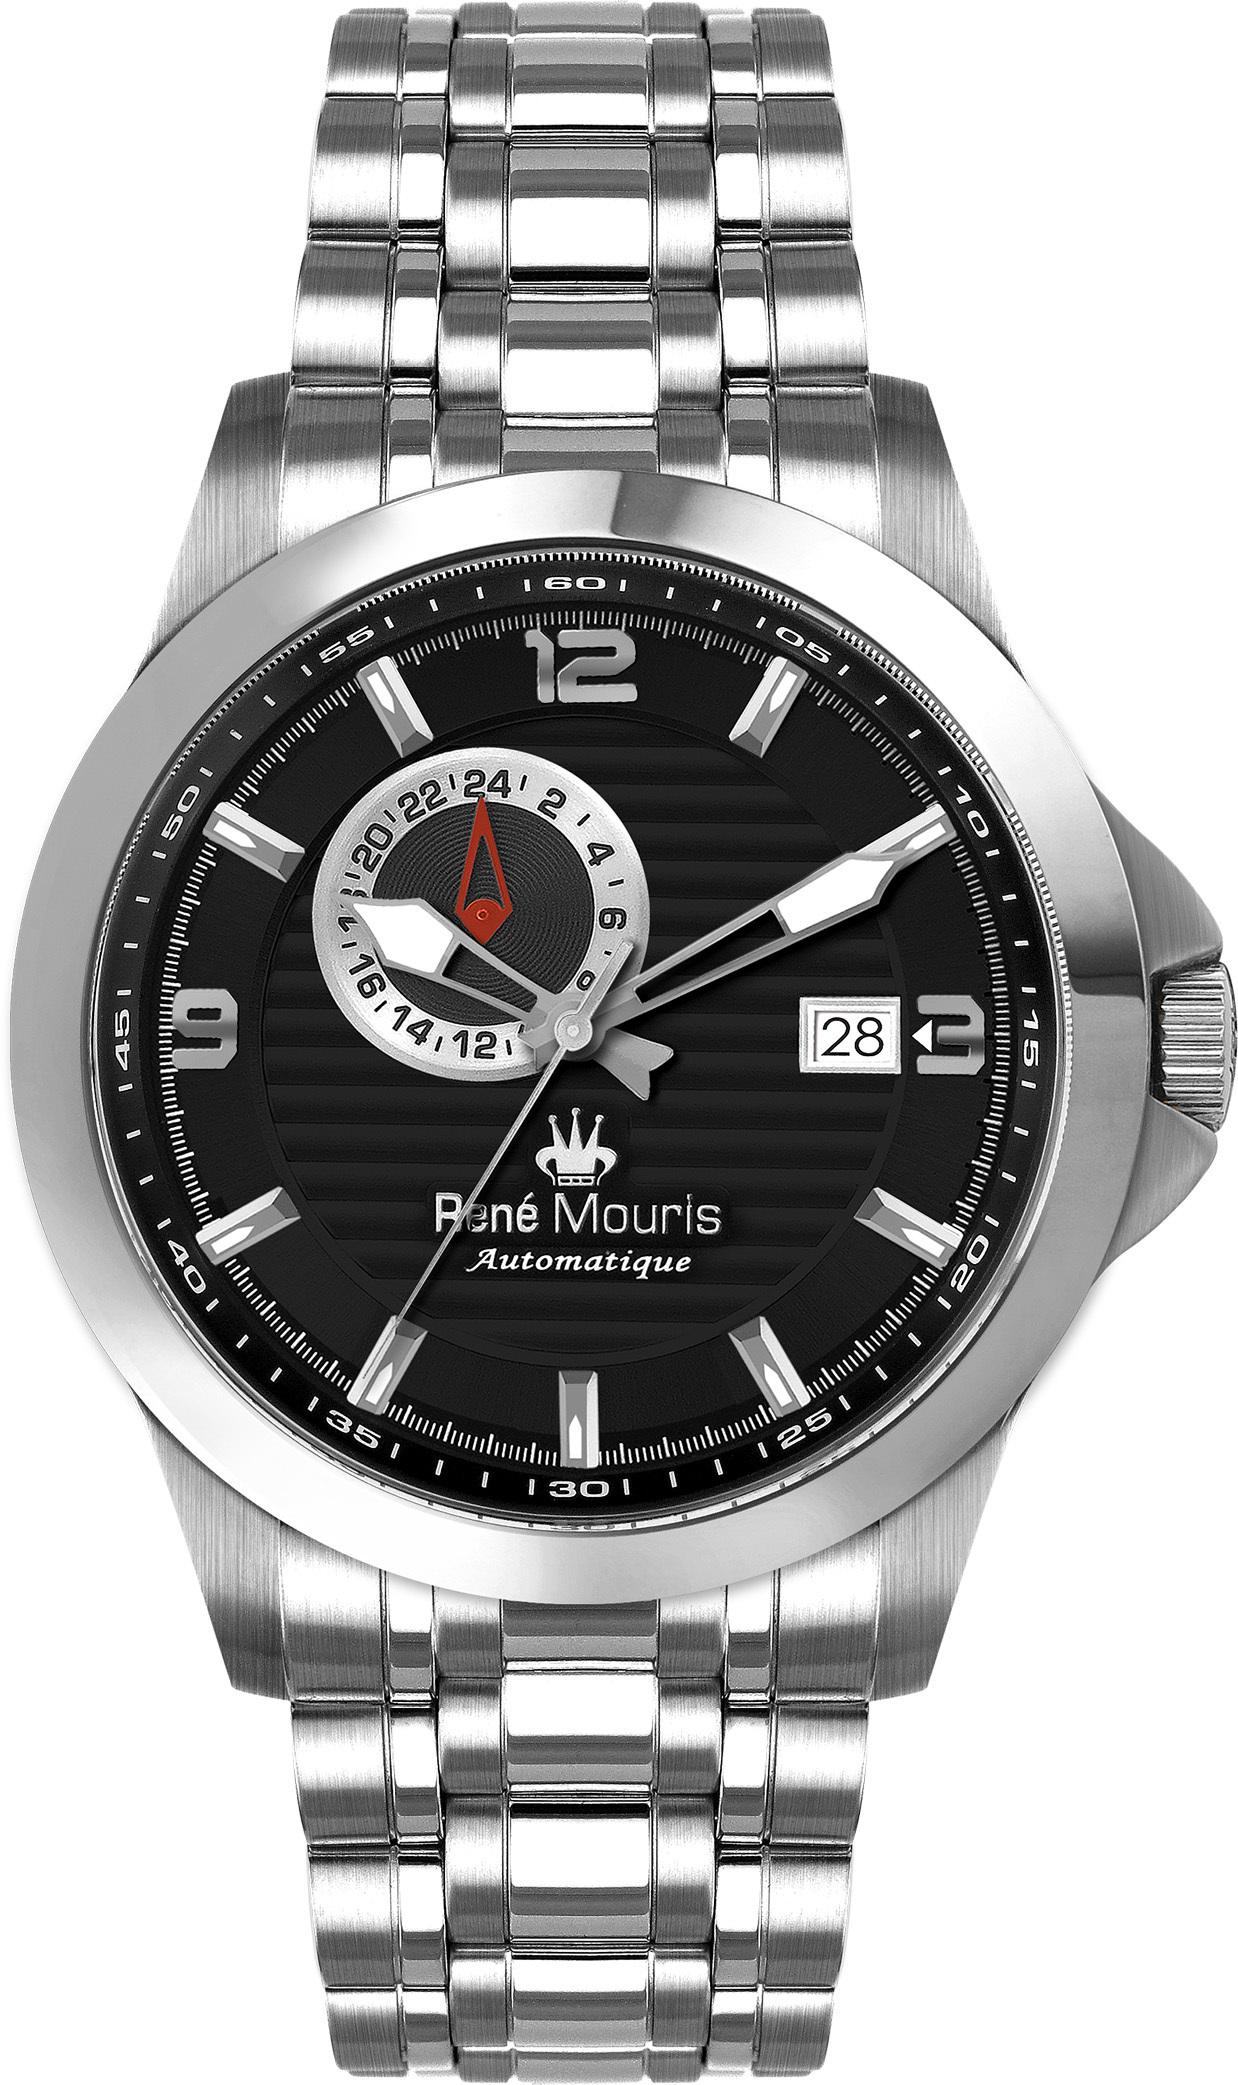 Rene Mouris Automatic Watch - Steel - Cygnus - 70104RM2